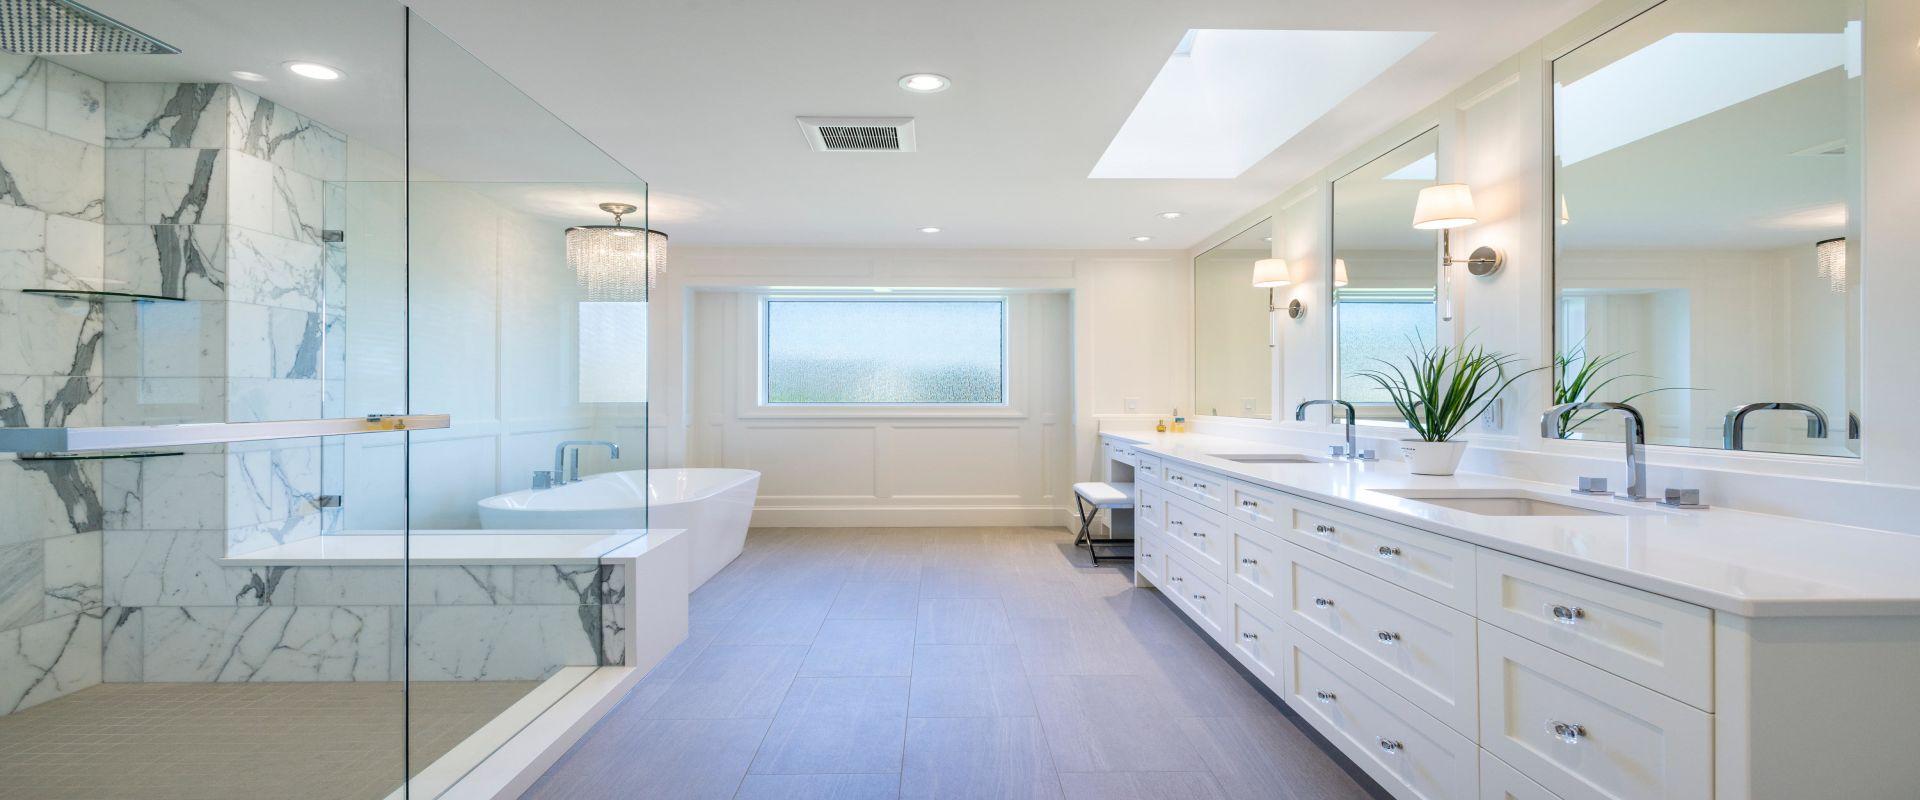 Versa Homes - Custom Home Builds & Renovations